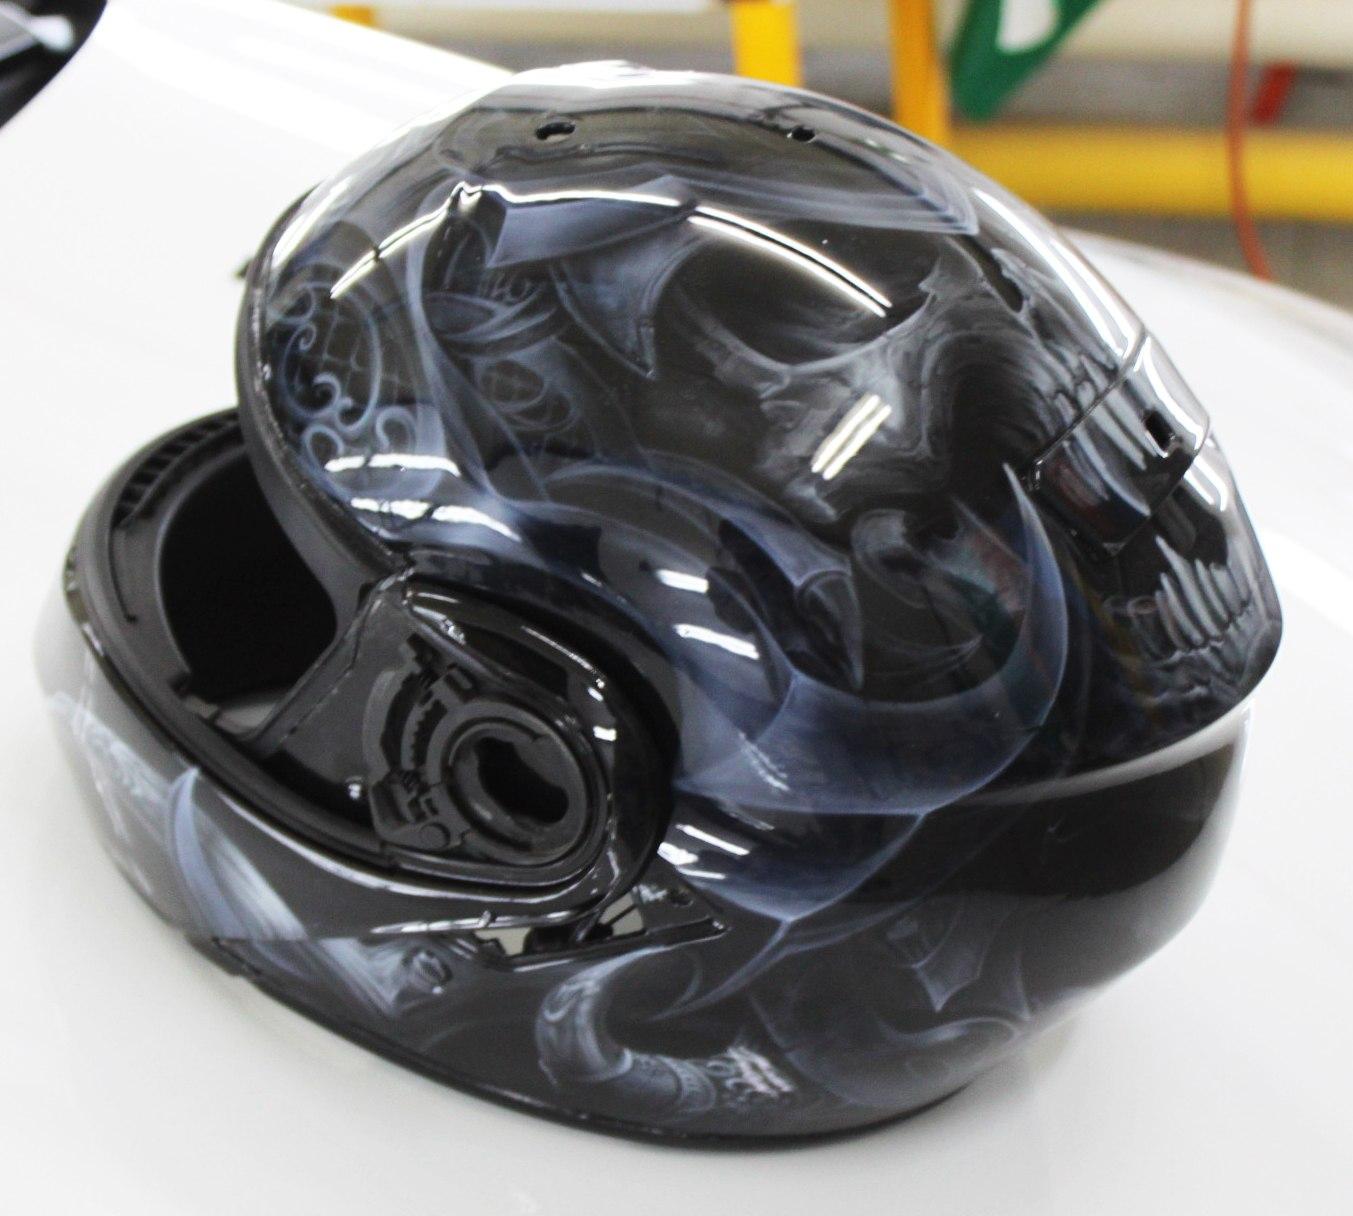 комплект мотоцикл и шлем Yamaha